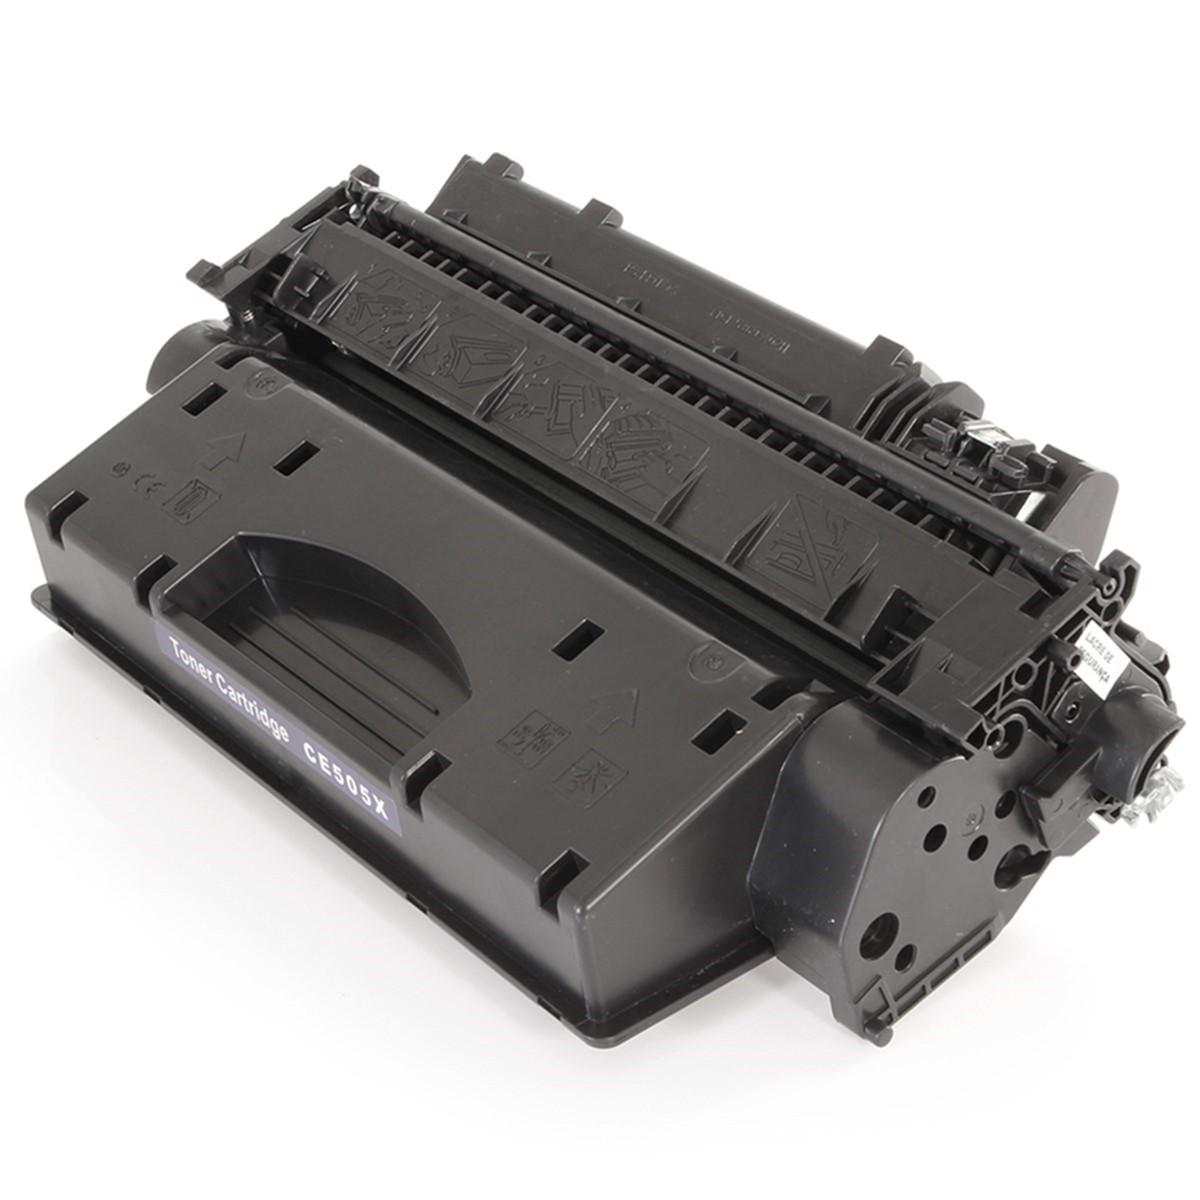 CARTUCHO HP (CE505X/CF280X) P2055/M401/M425/2055N/2055DN/2055X COMPATÍVEL